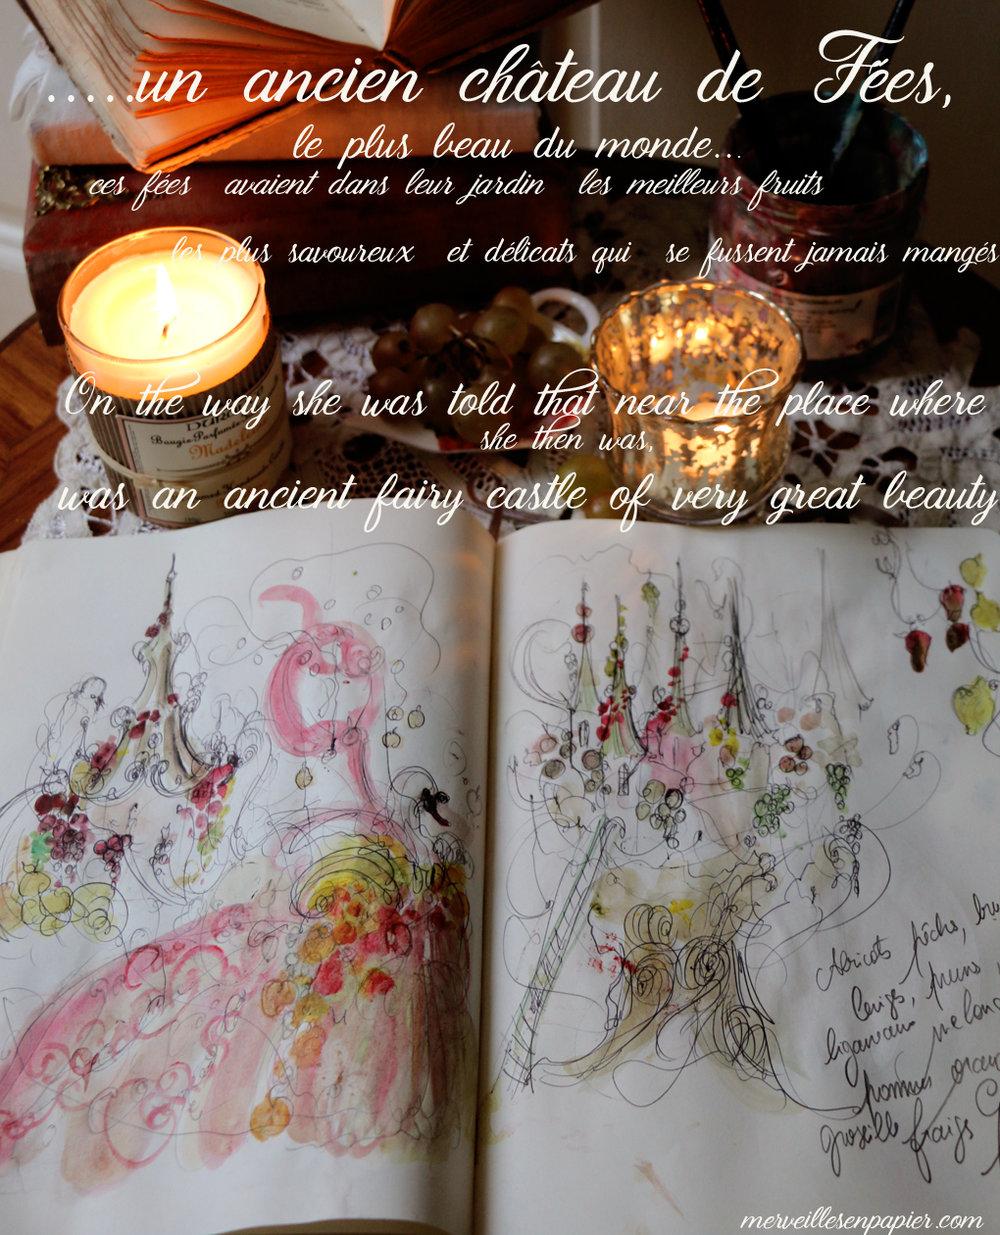 fairy tales madame d'aulnoy